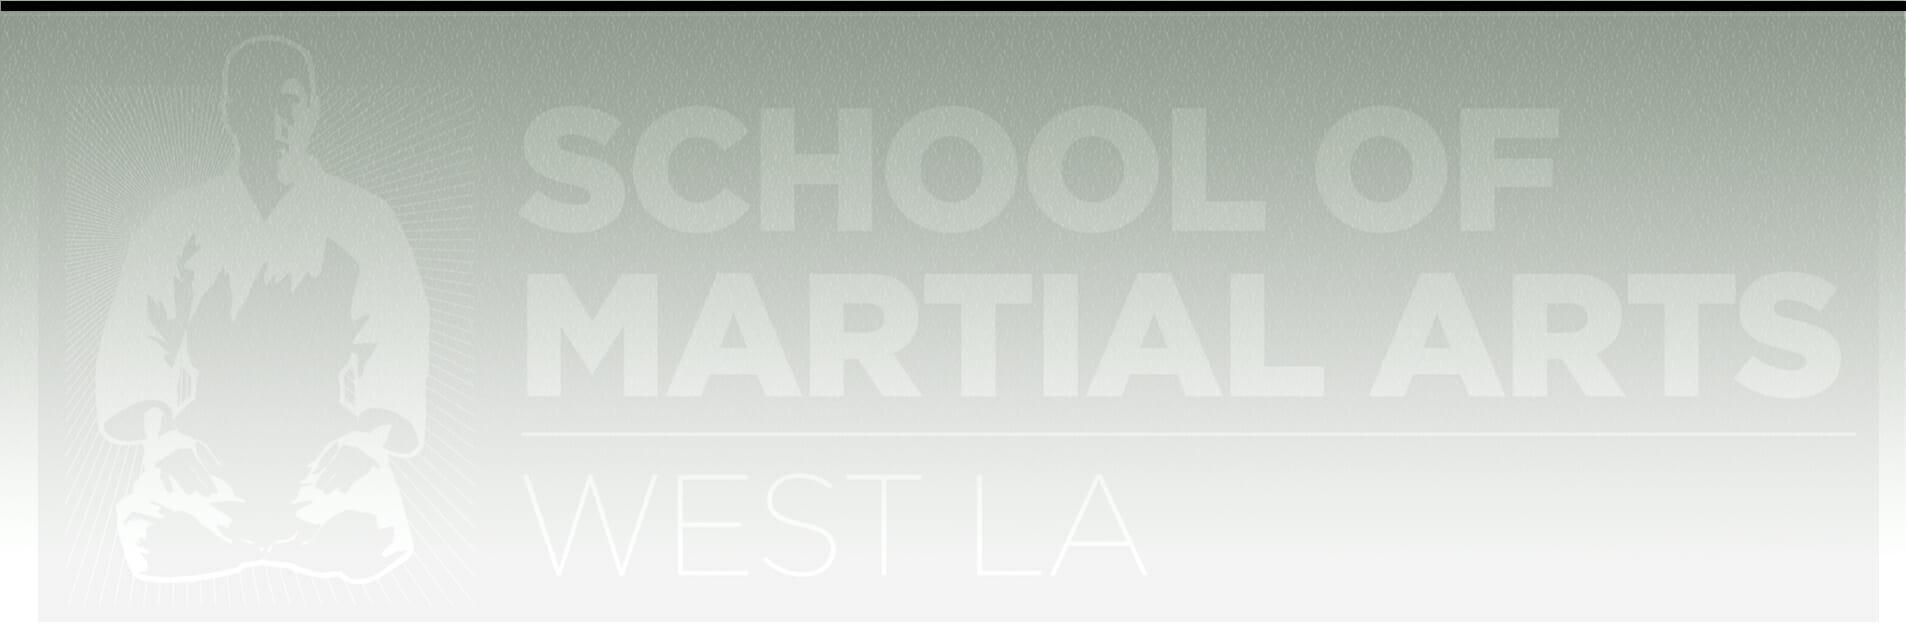 School of Martial Arts background